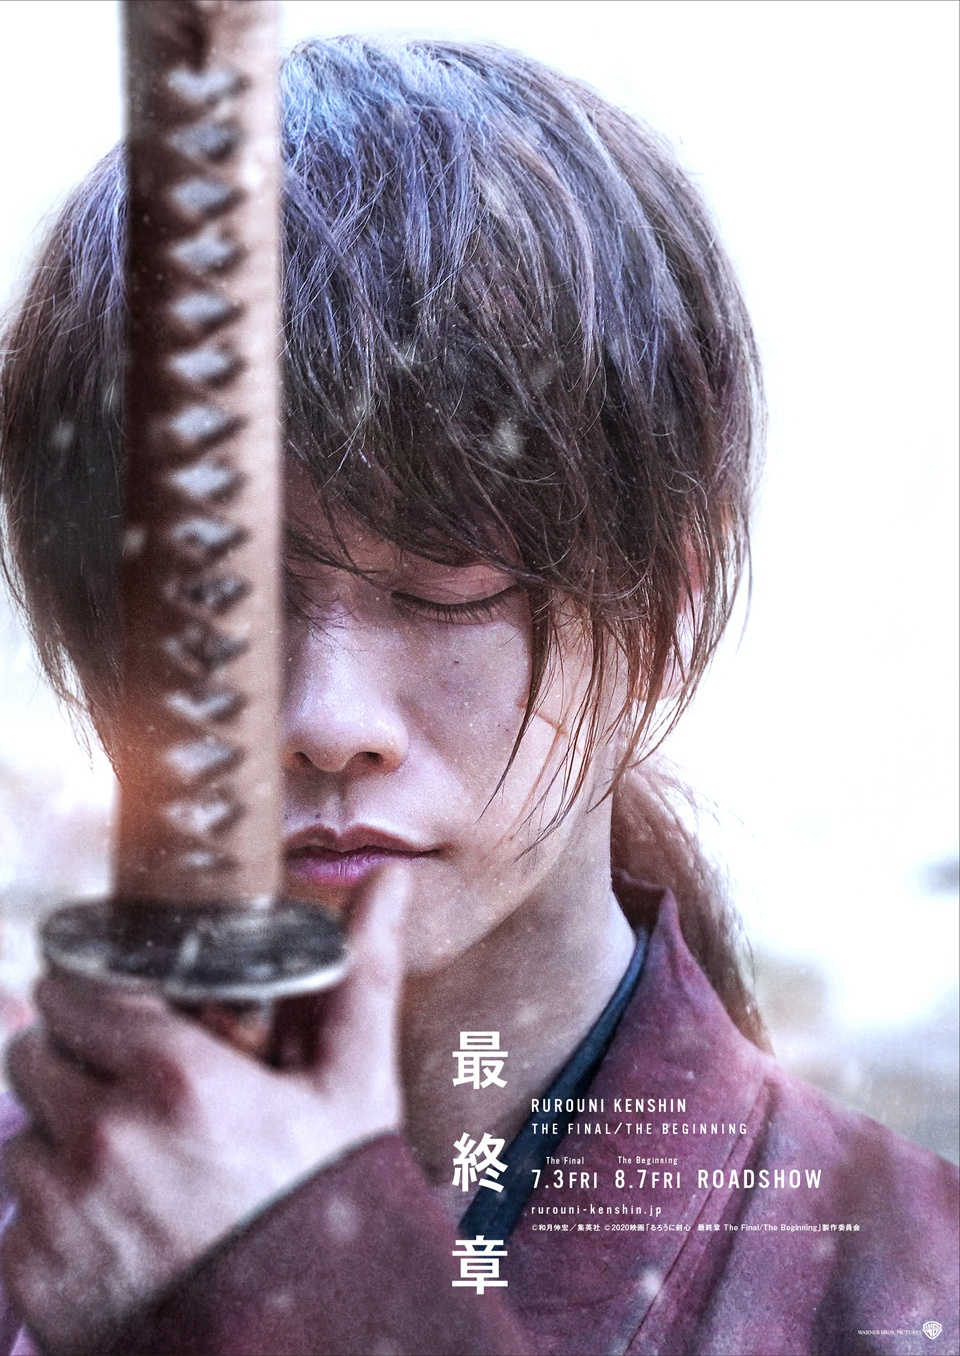 Live-action Rurouni Kenshin finale films finally get release dates